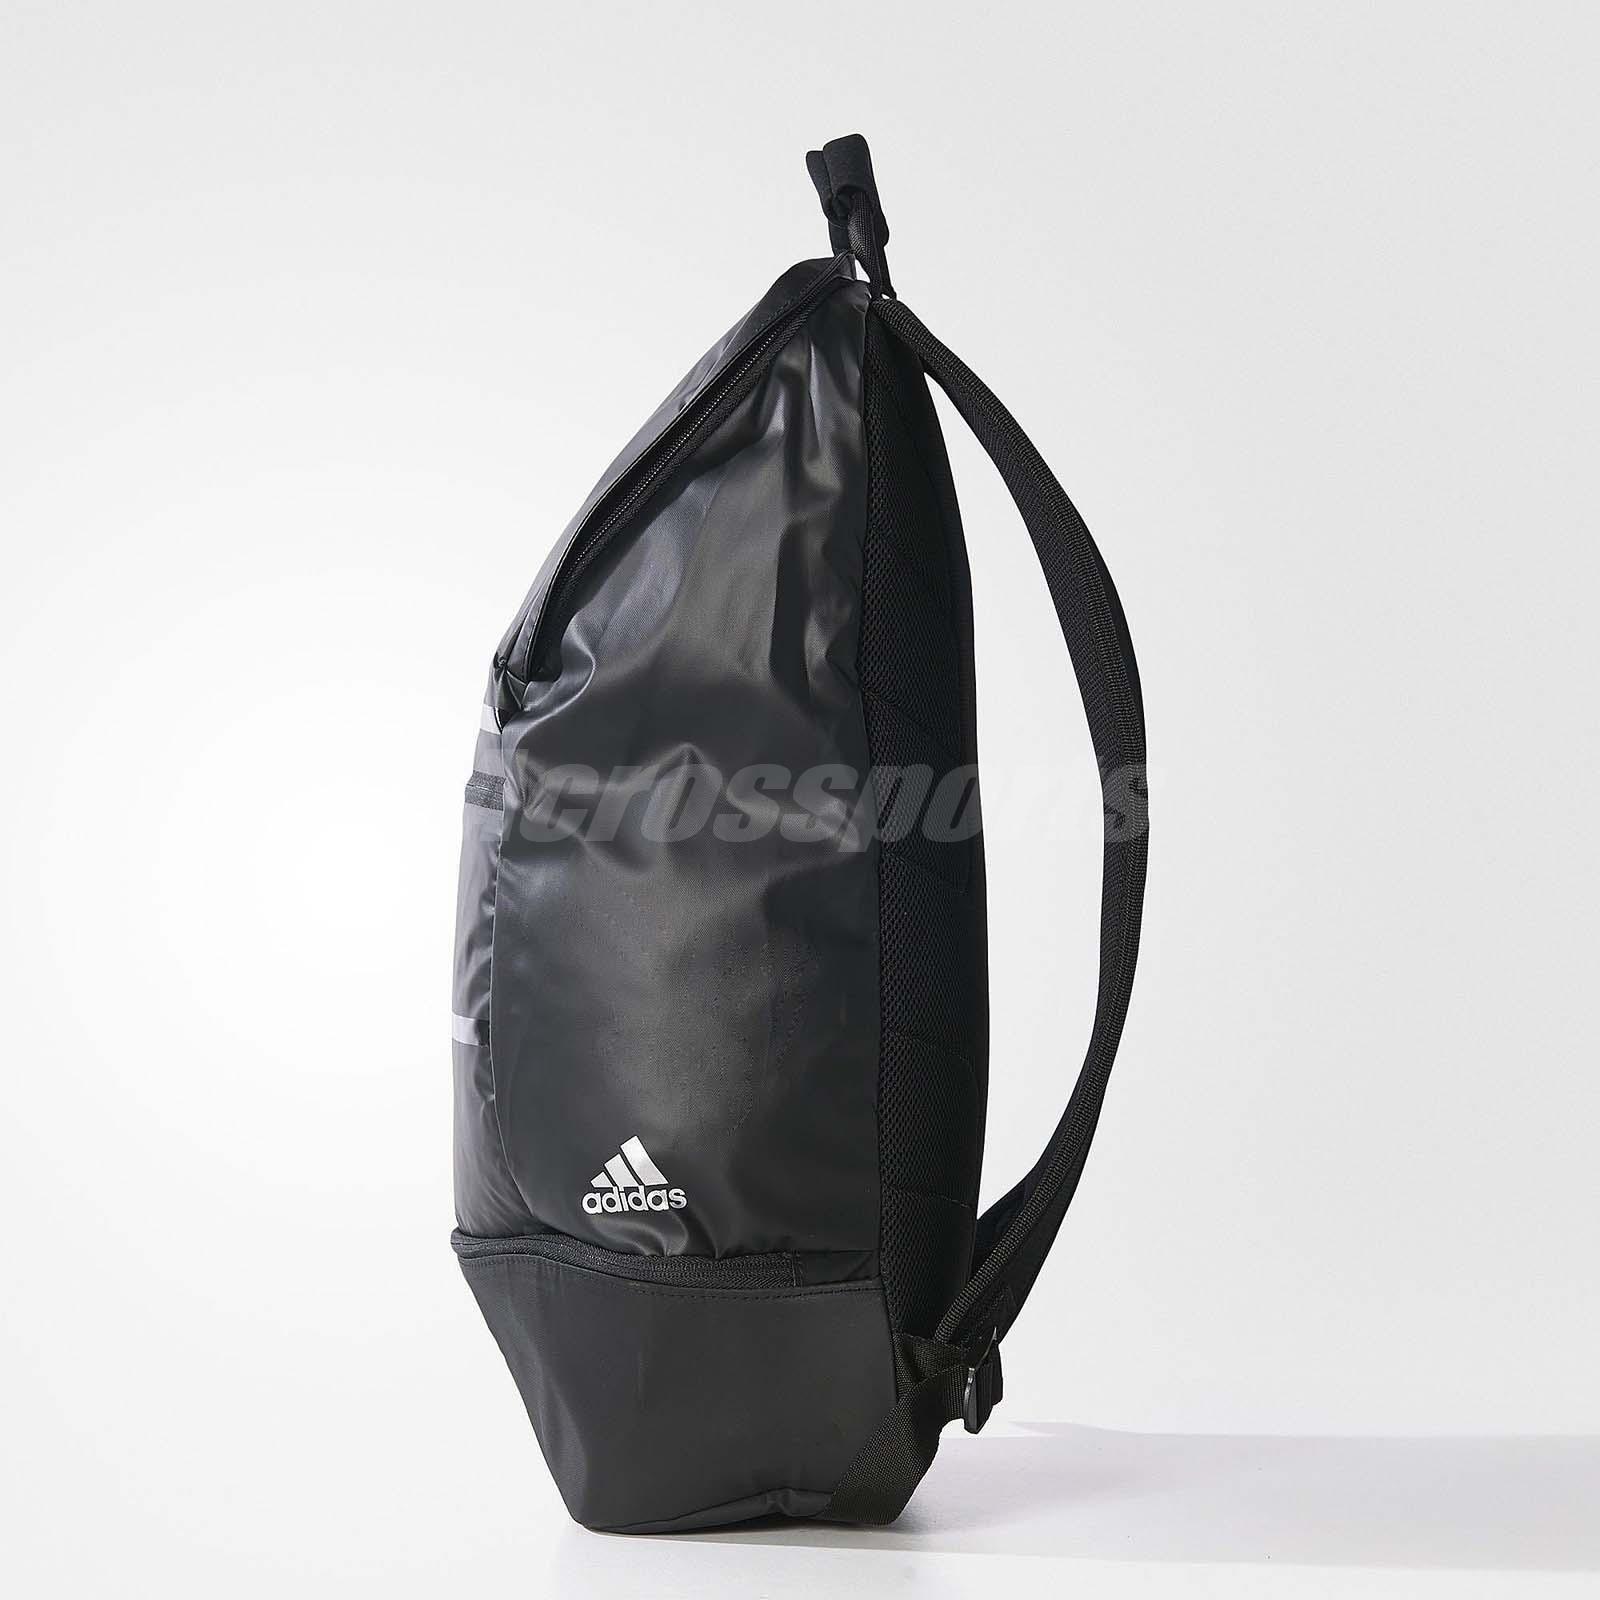 adidas climacool bag